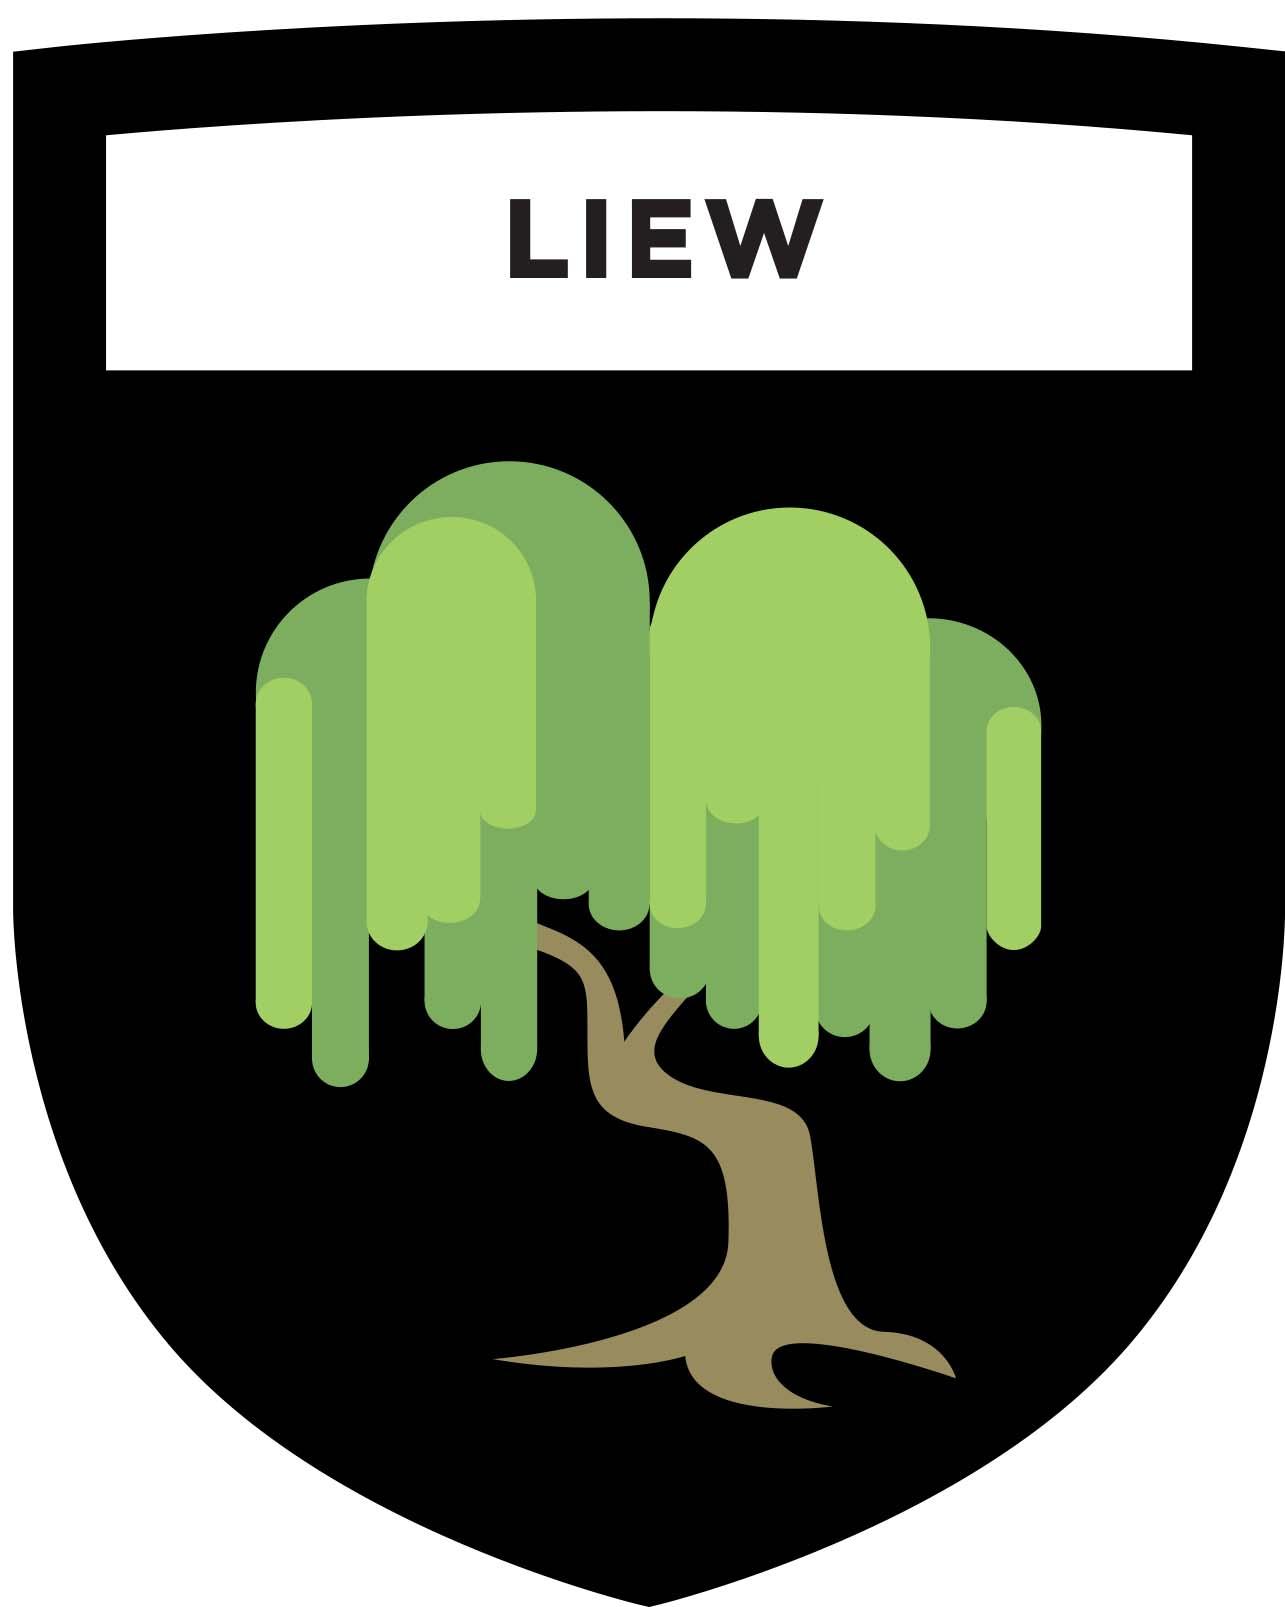 Liew Shield